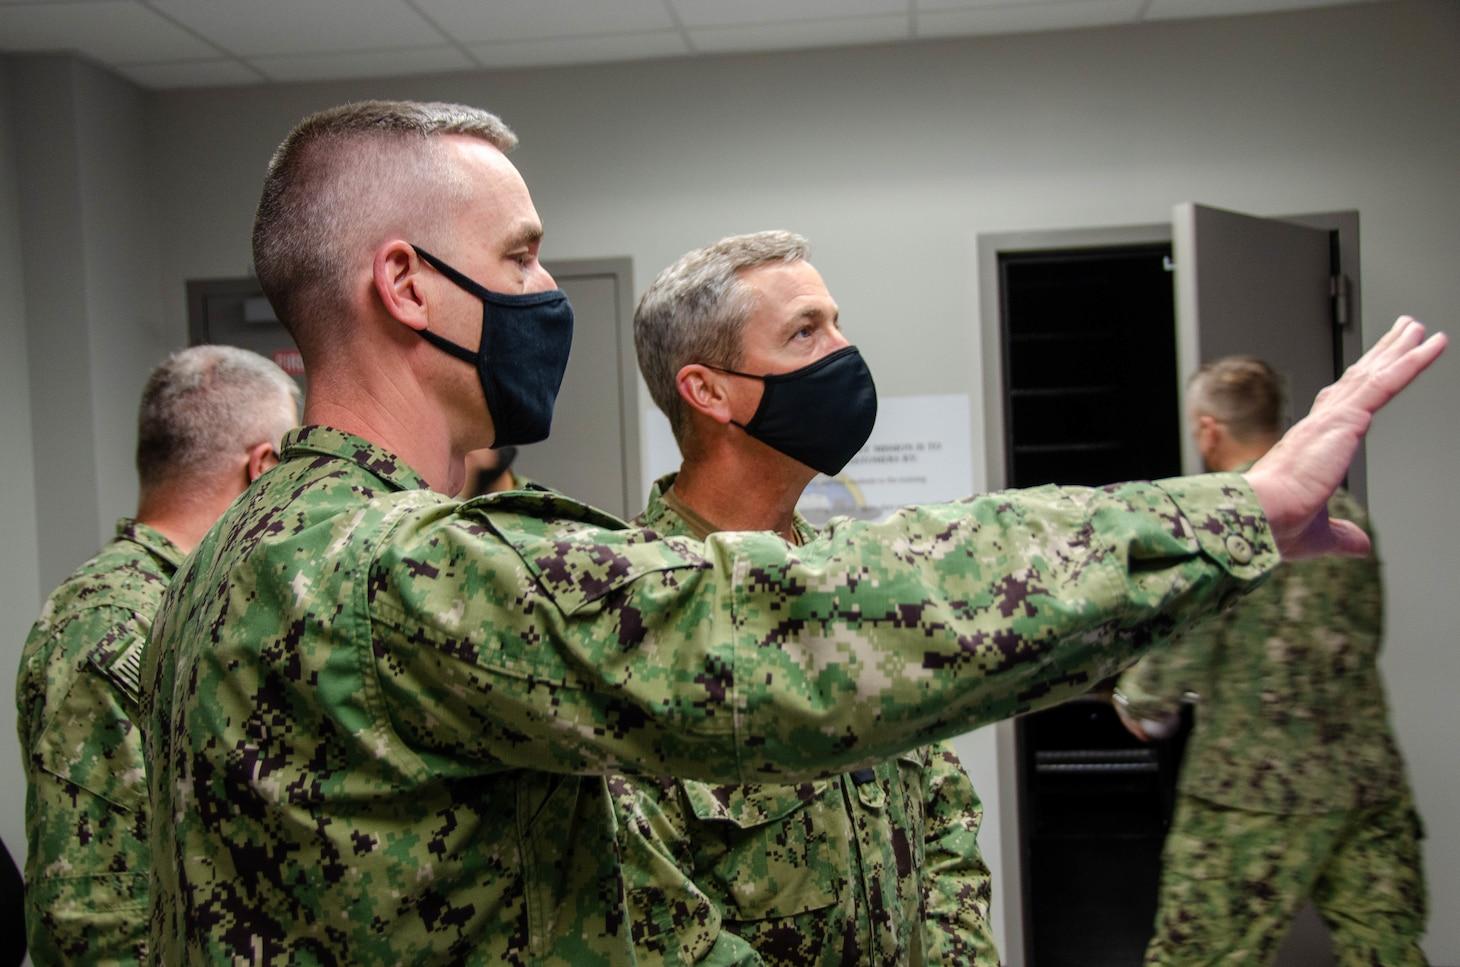 GROTON, Conn. (April 14, 2021) Rear Adm. Pete Garvin, commander, Naval Education and Training Command, visits Naval Submarine School. (U.S. Navy photo by Charles E. Spirtos)